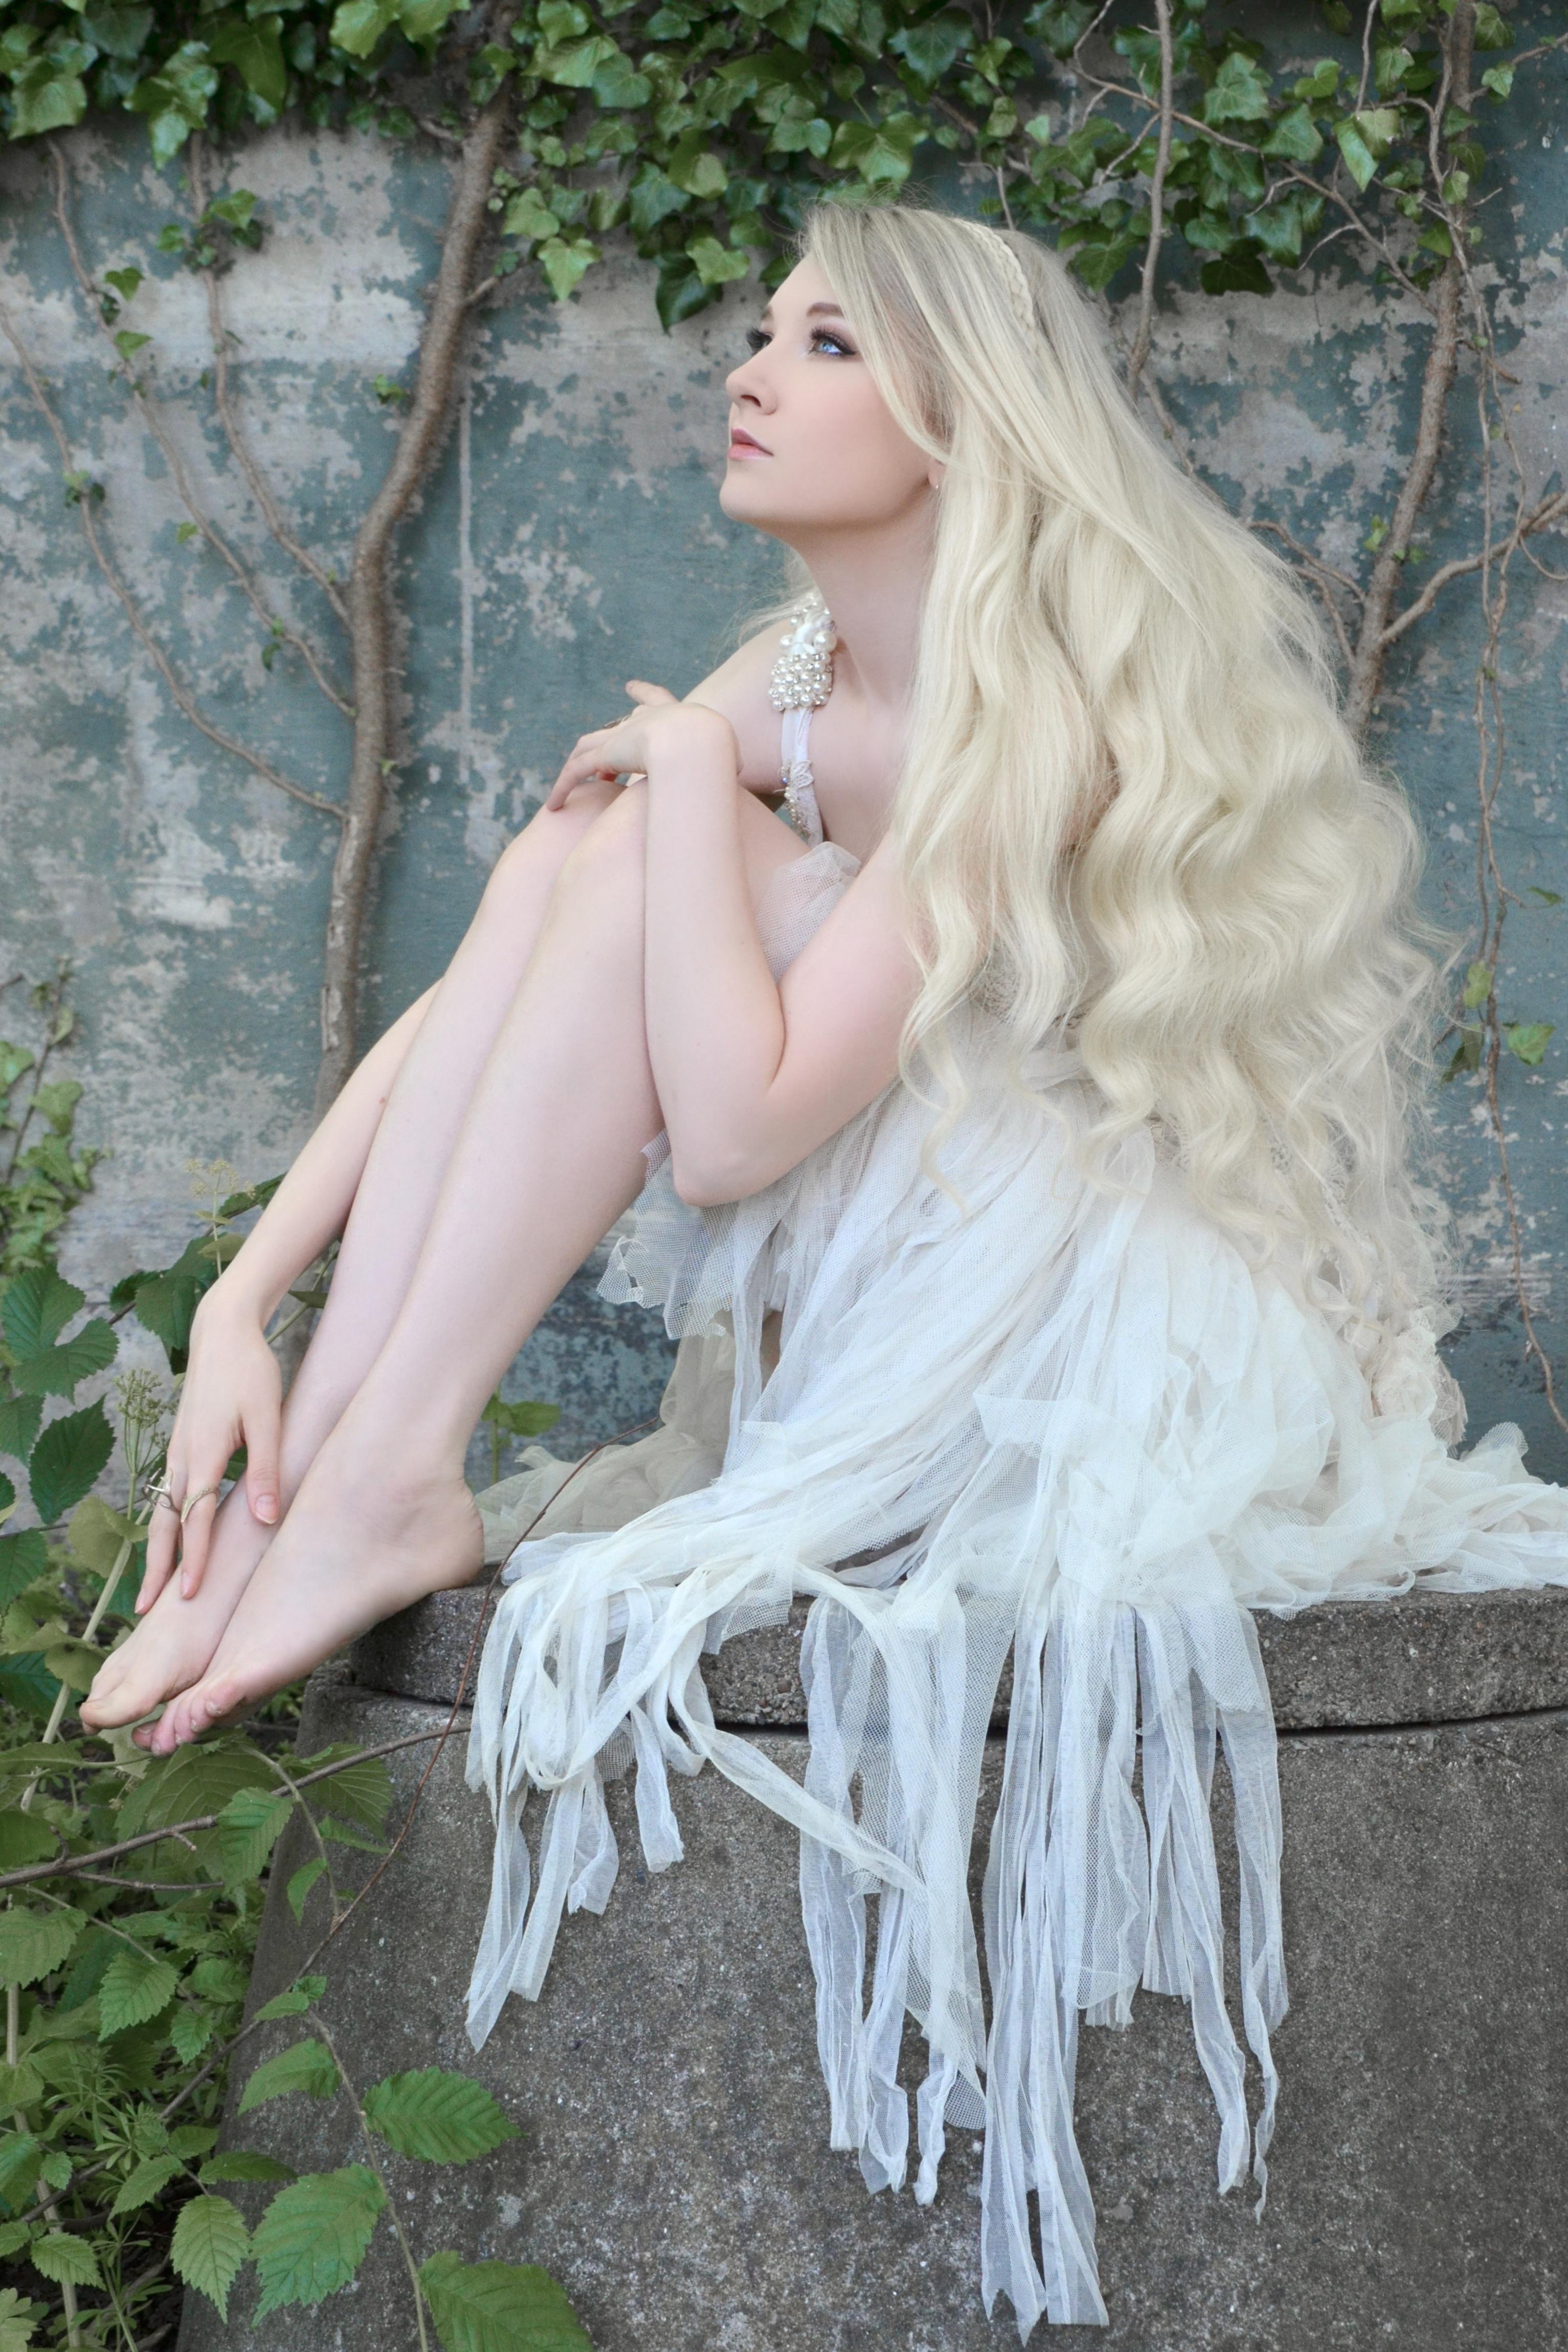 The Goddess Alyssa